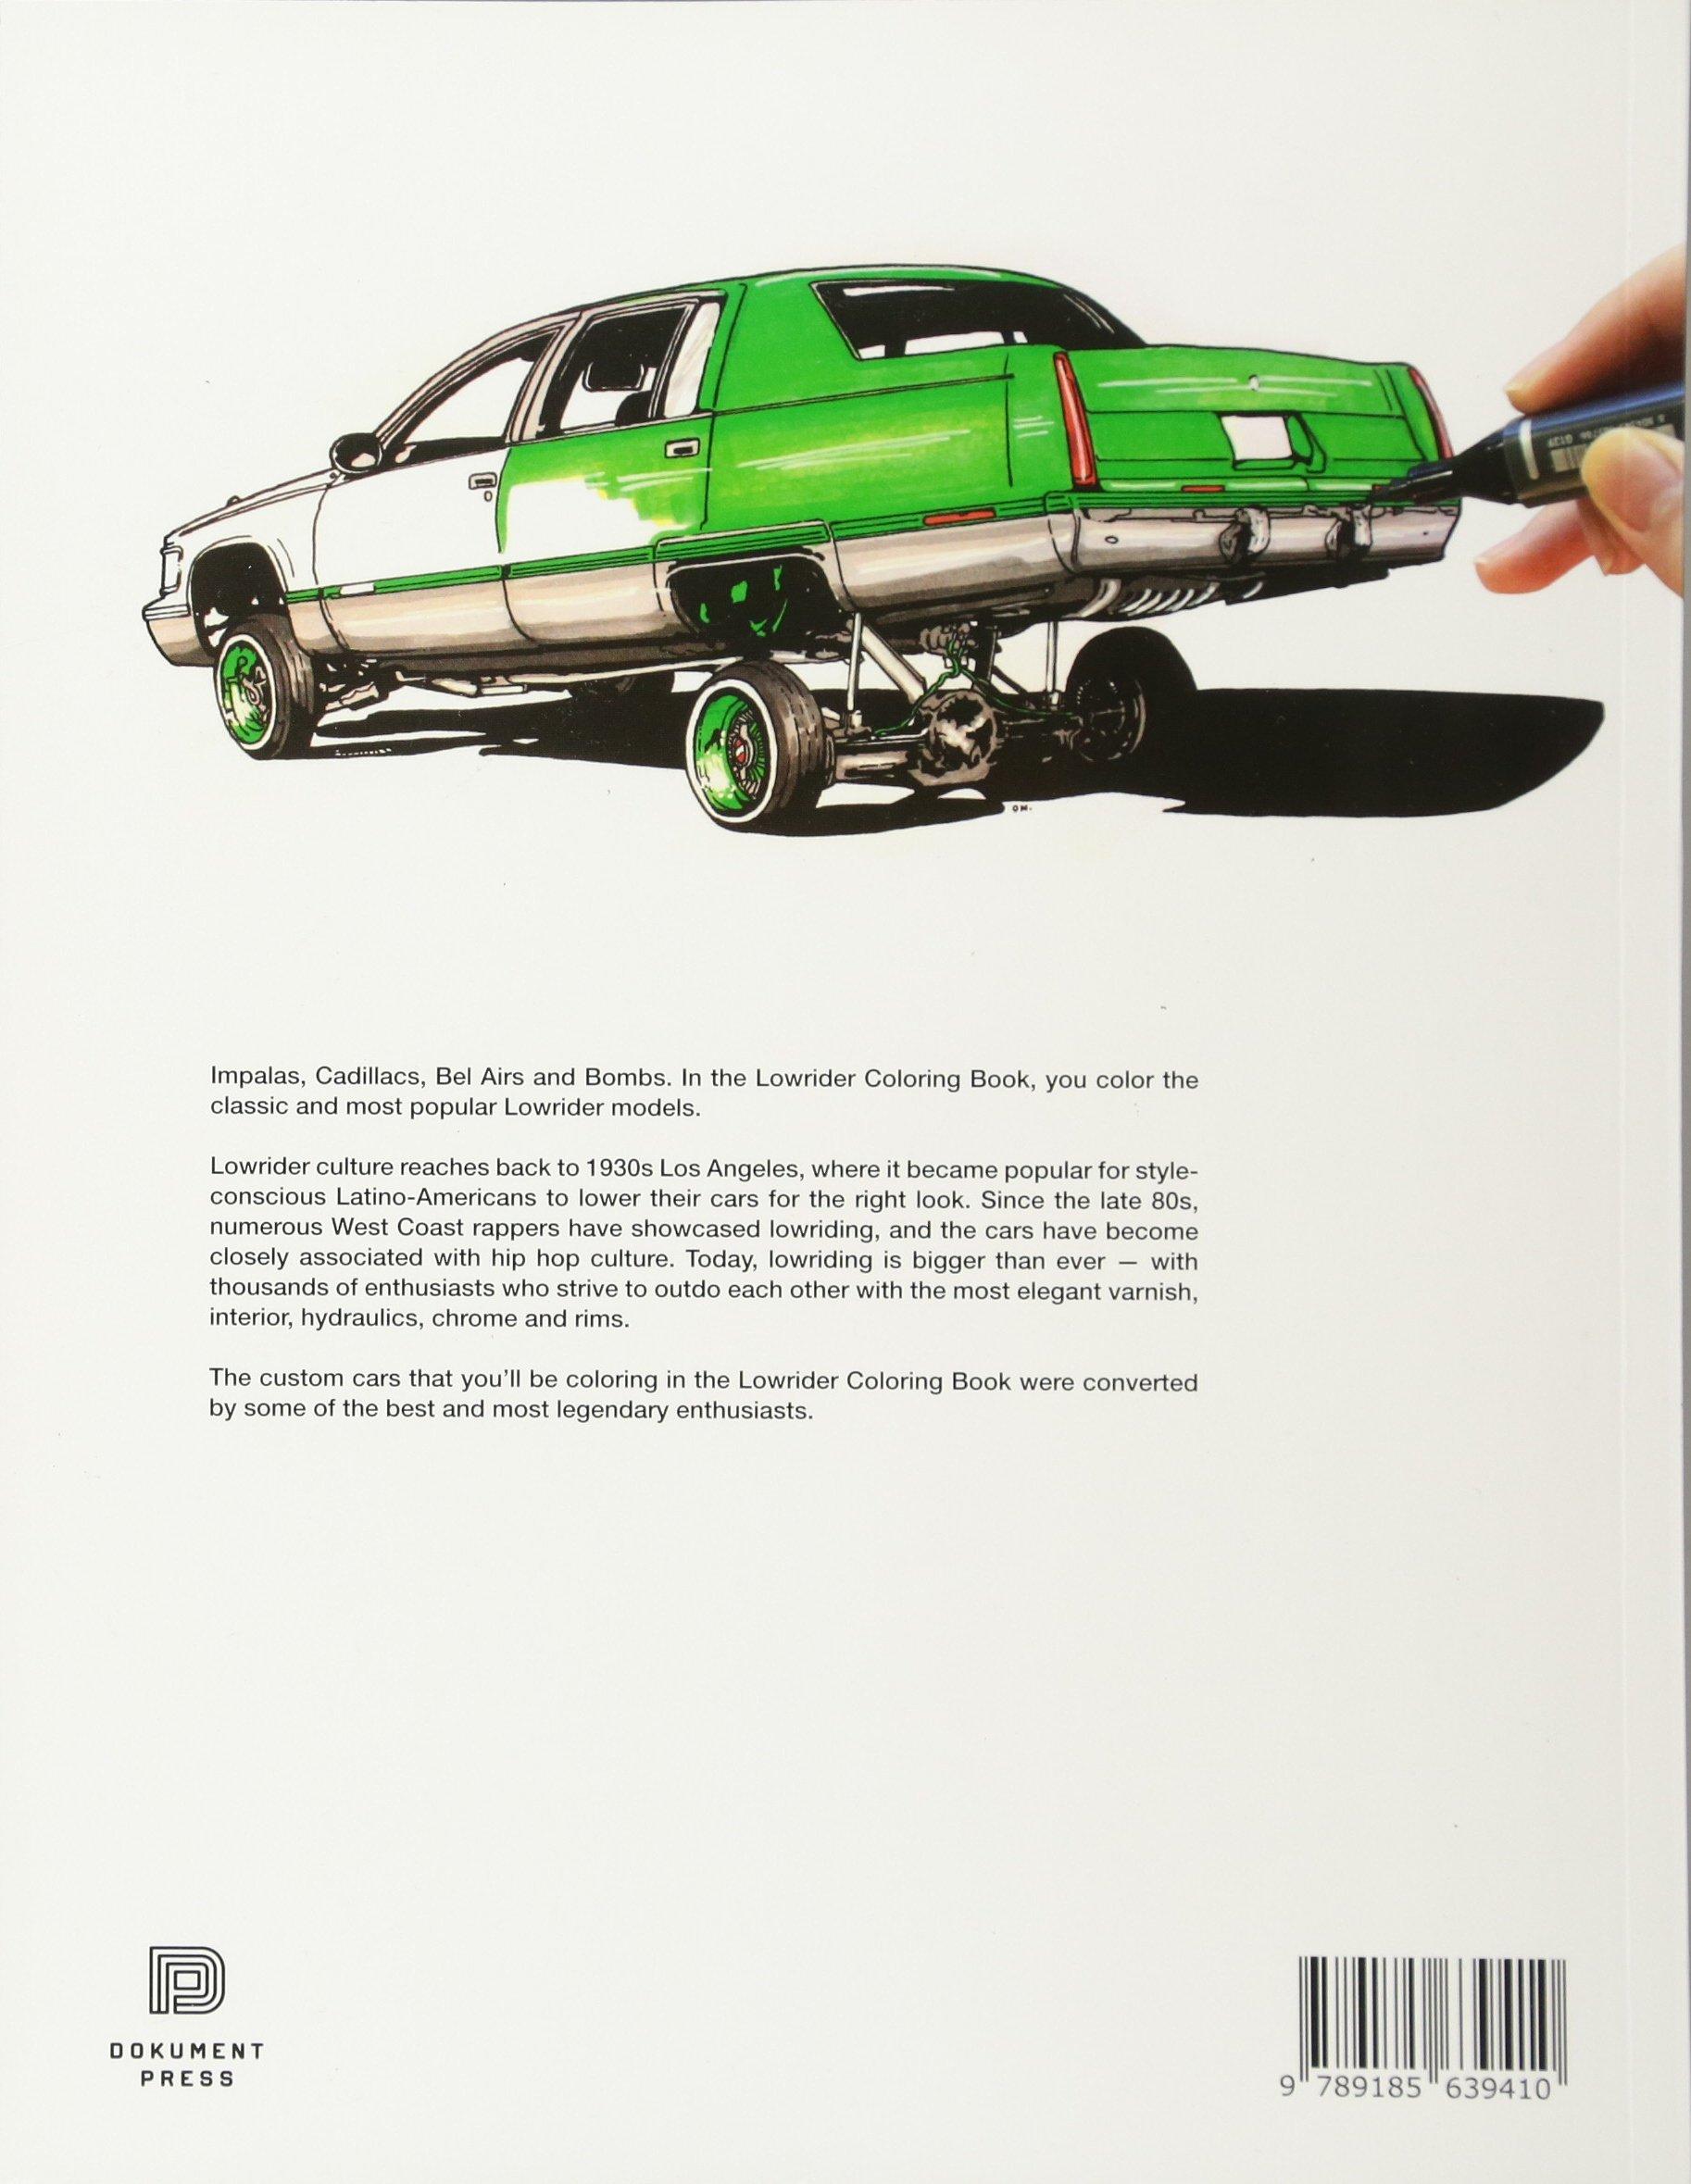 Lowrider Coloring Book Oscar Nilsson 9789185639410 Amazoncom